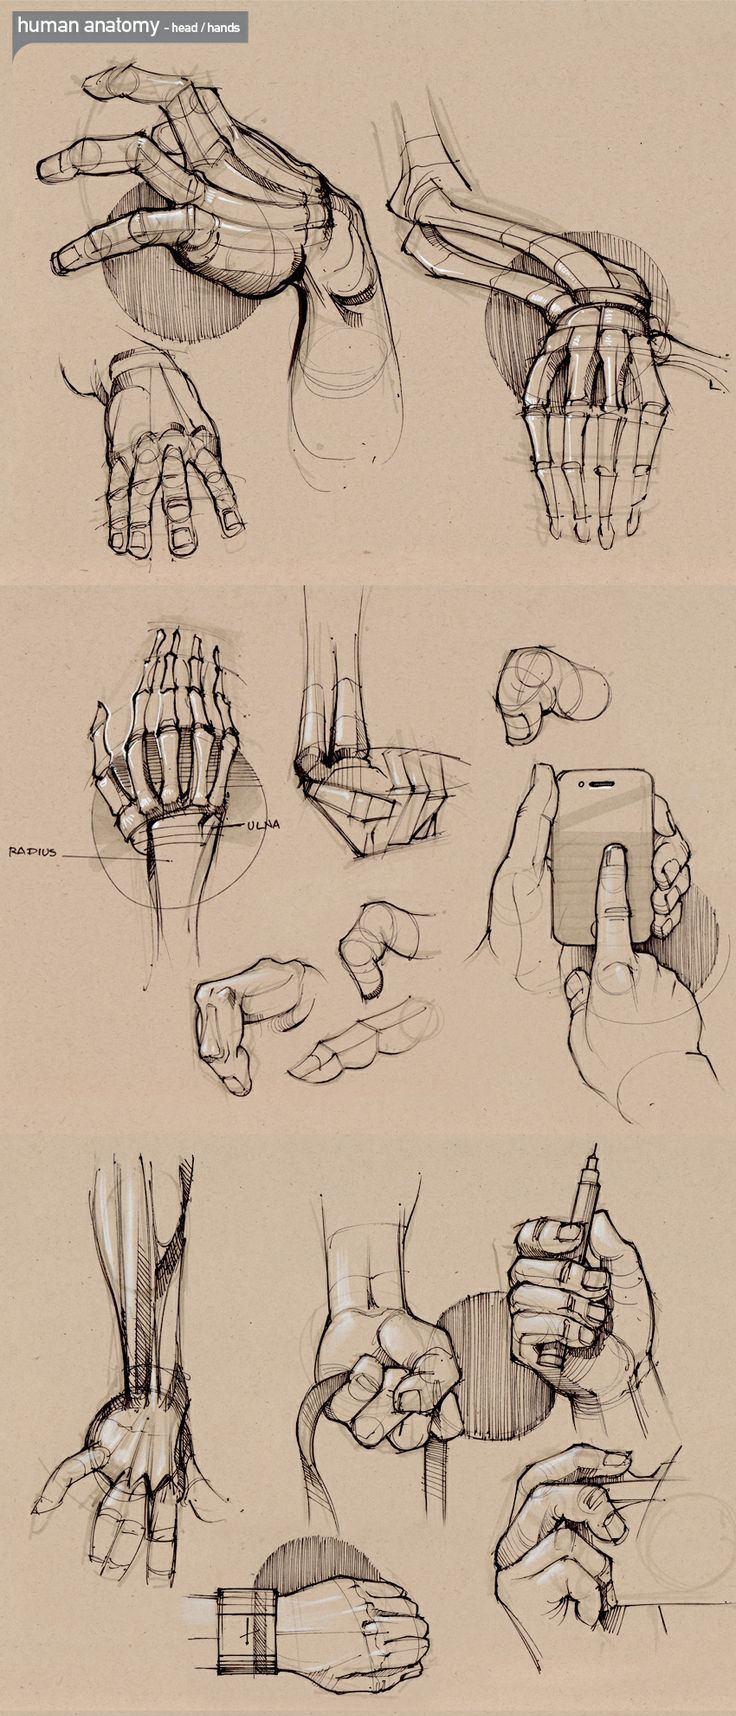 Aprenda a Desenhar #1 | Pinterest | Anatomy, Draw and Sketches